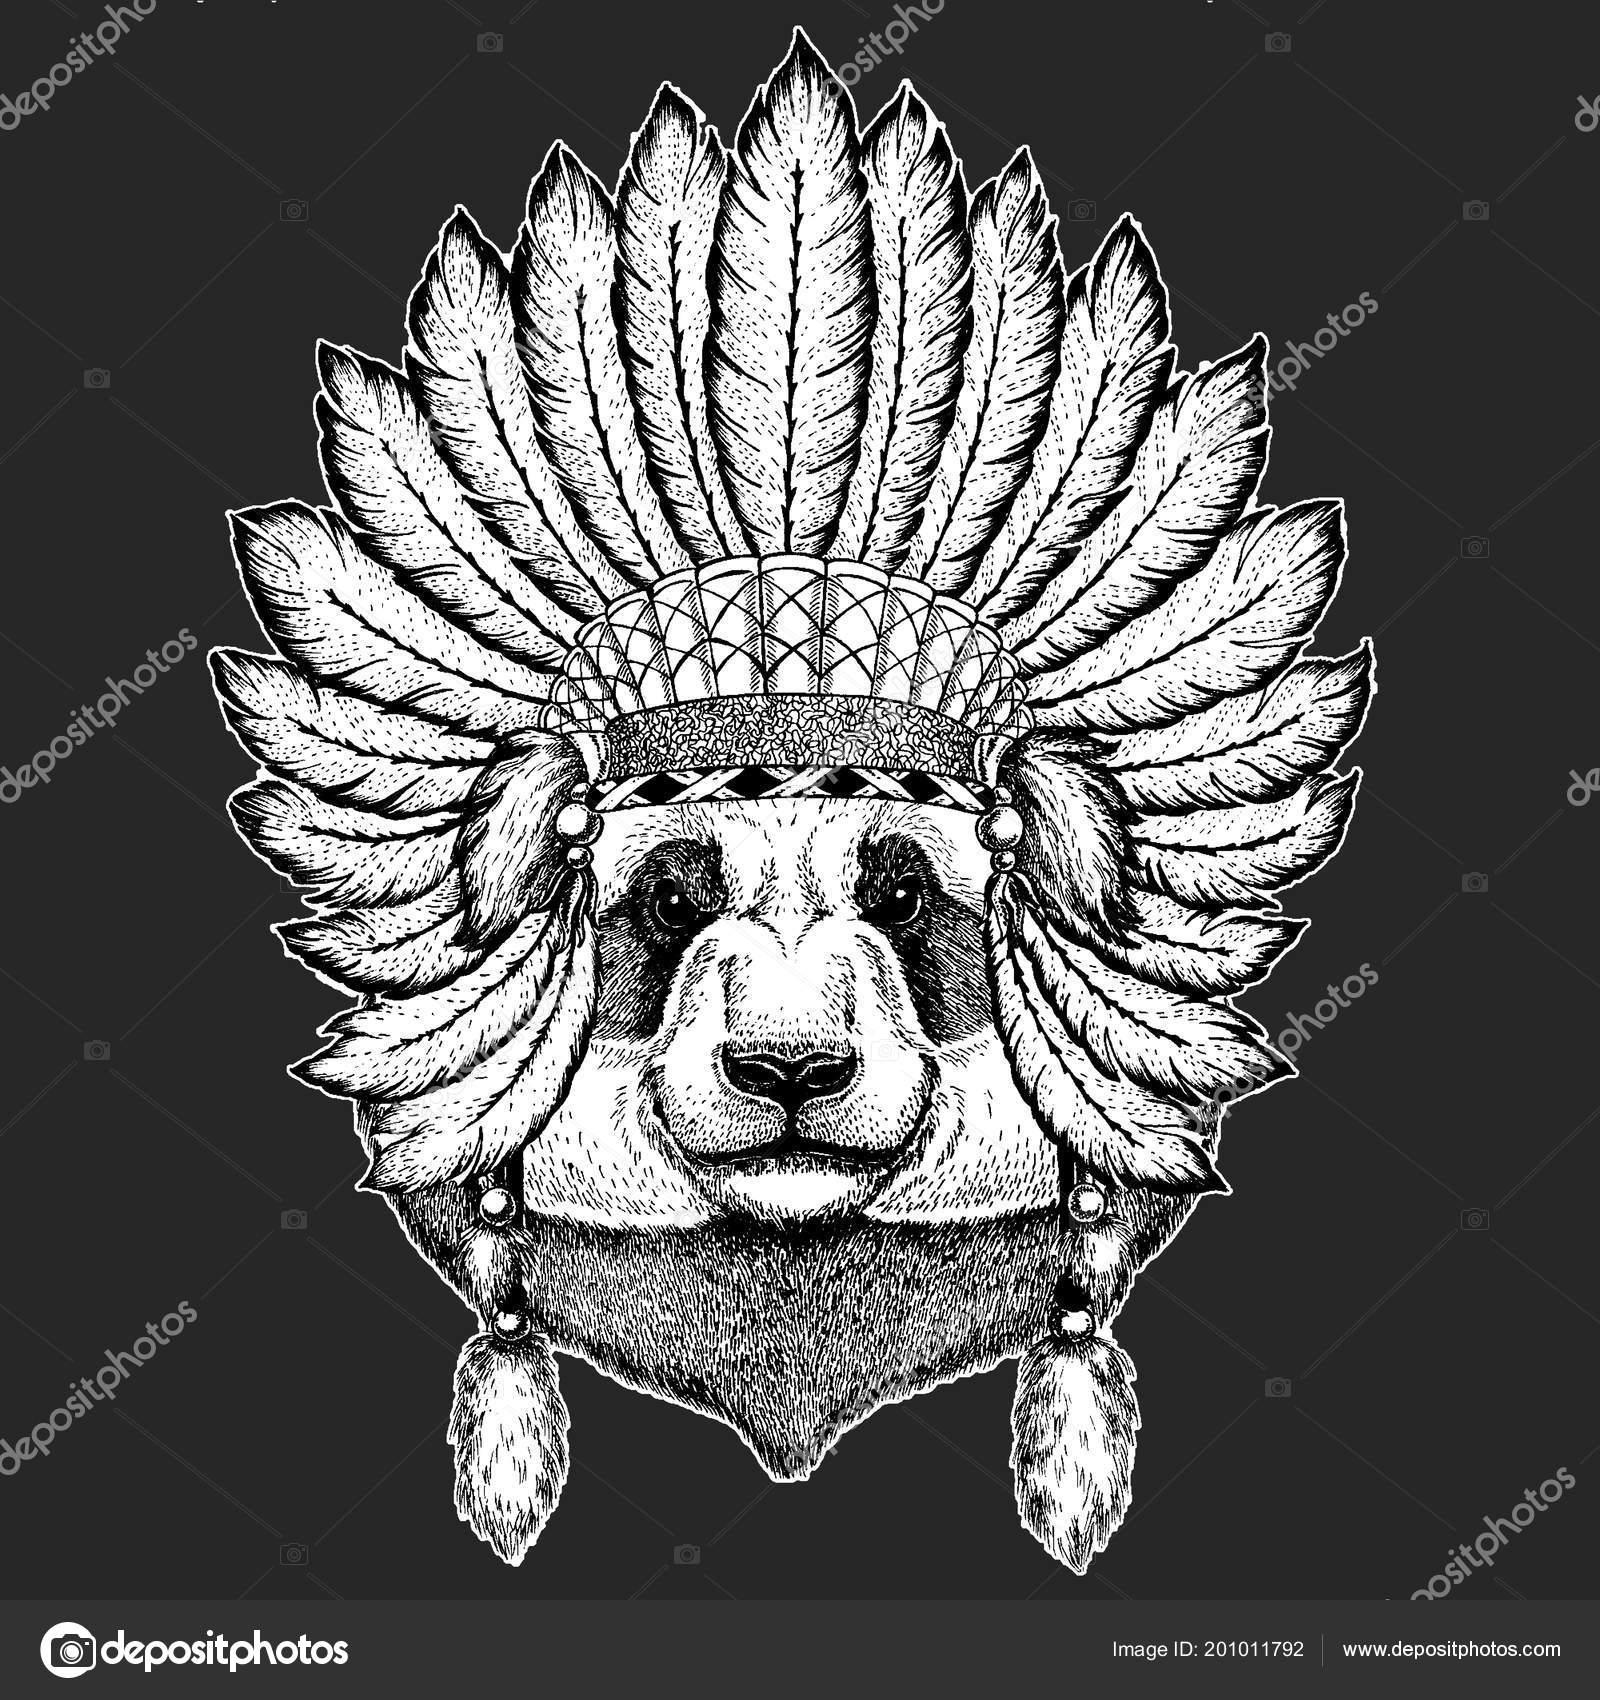 5b98f7f204a1d Traditional ethnic indian boho headdress Tribal shaman hat Ceremonial  element — · Bear, bamboo bear. Hand drawn image for tattoo, emblem, badge,  ...